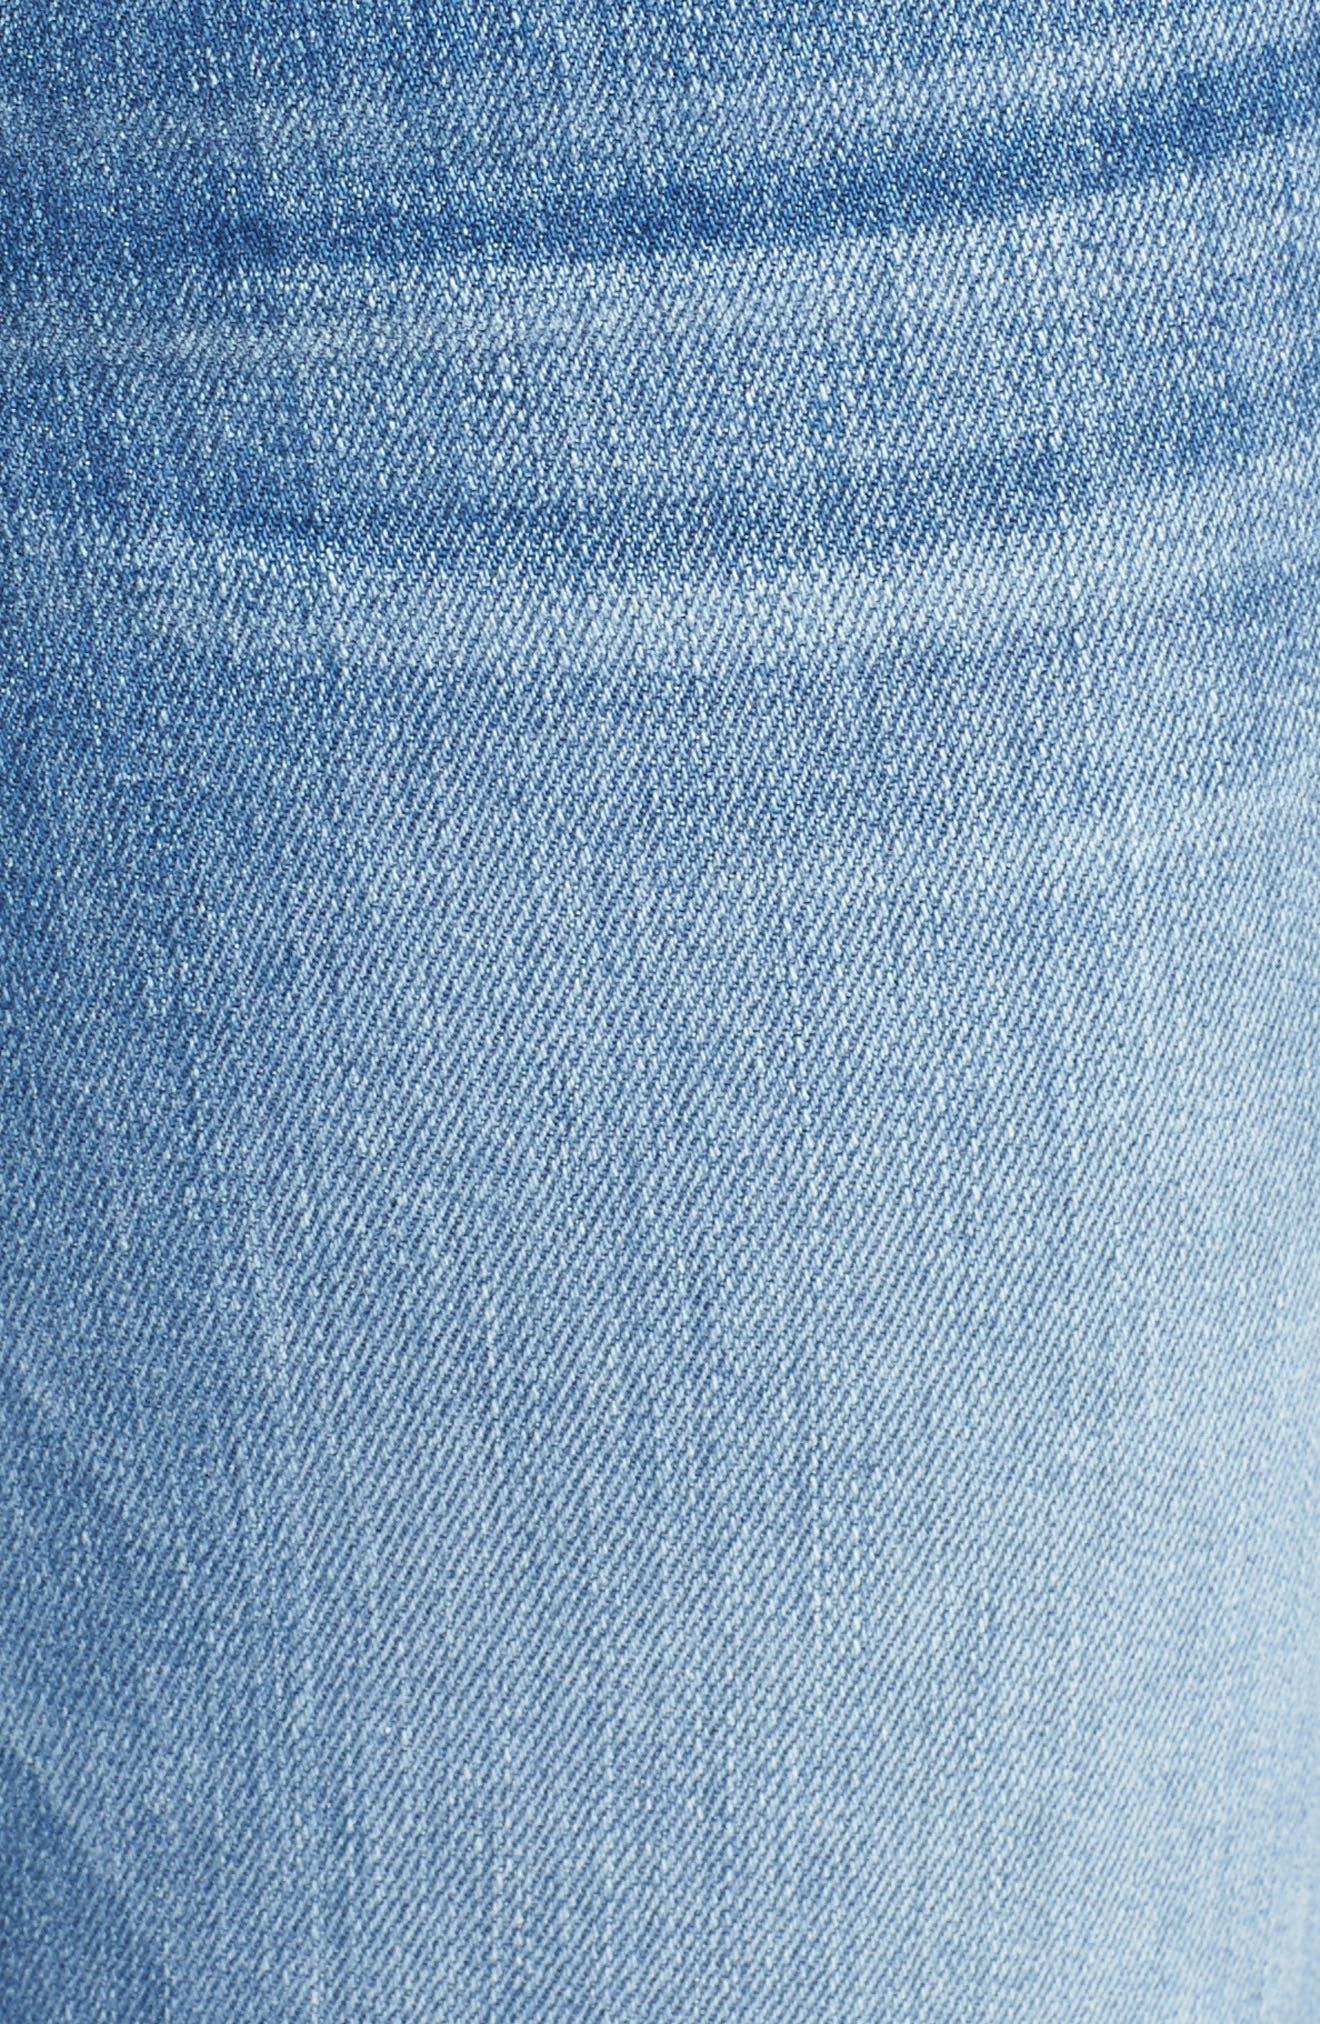 Transcend Vintage - Verdugo Ultra Skinny Jeans,                             Alternate thumbnail 5, color,                             Atterbury